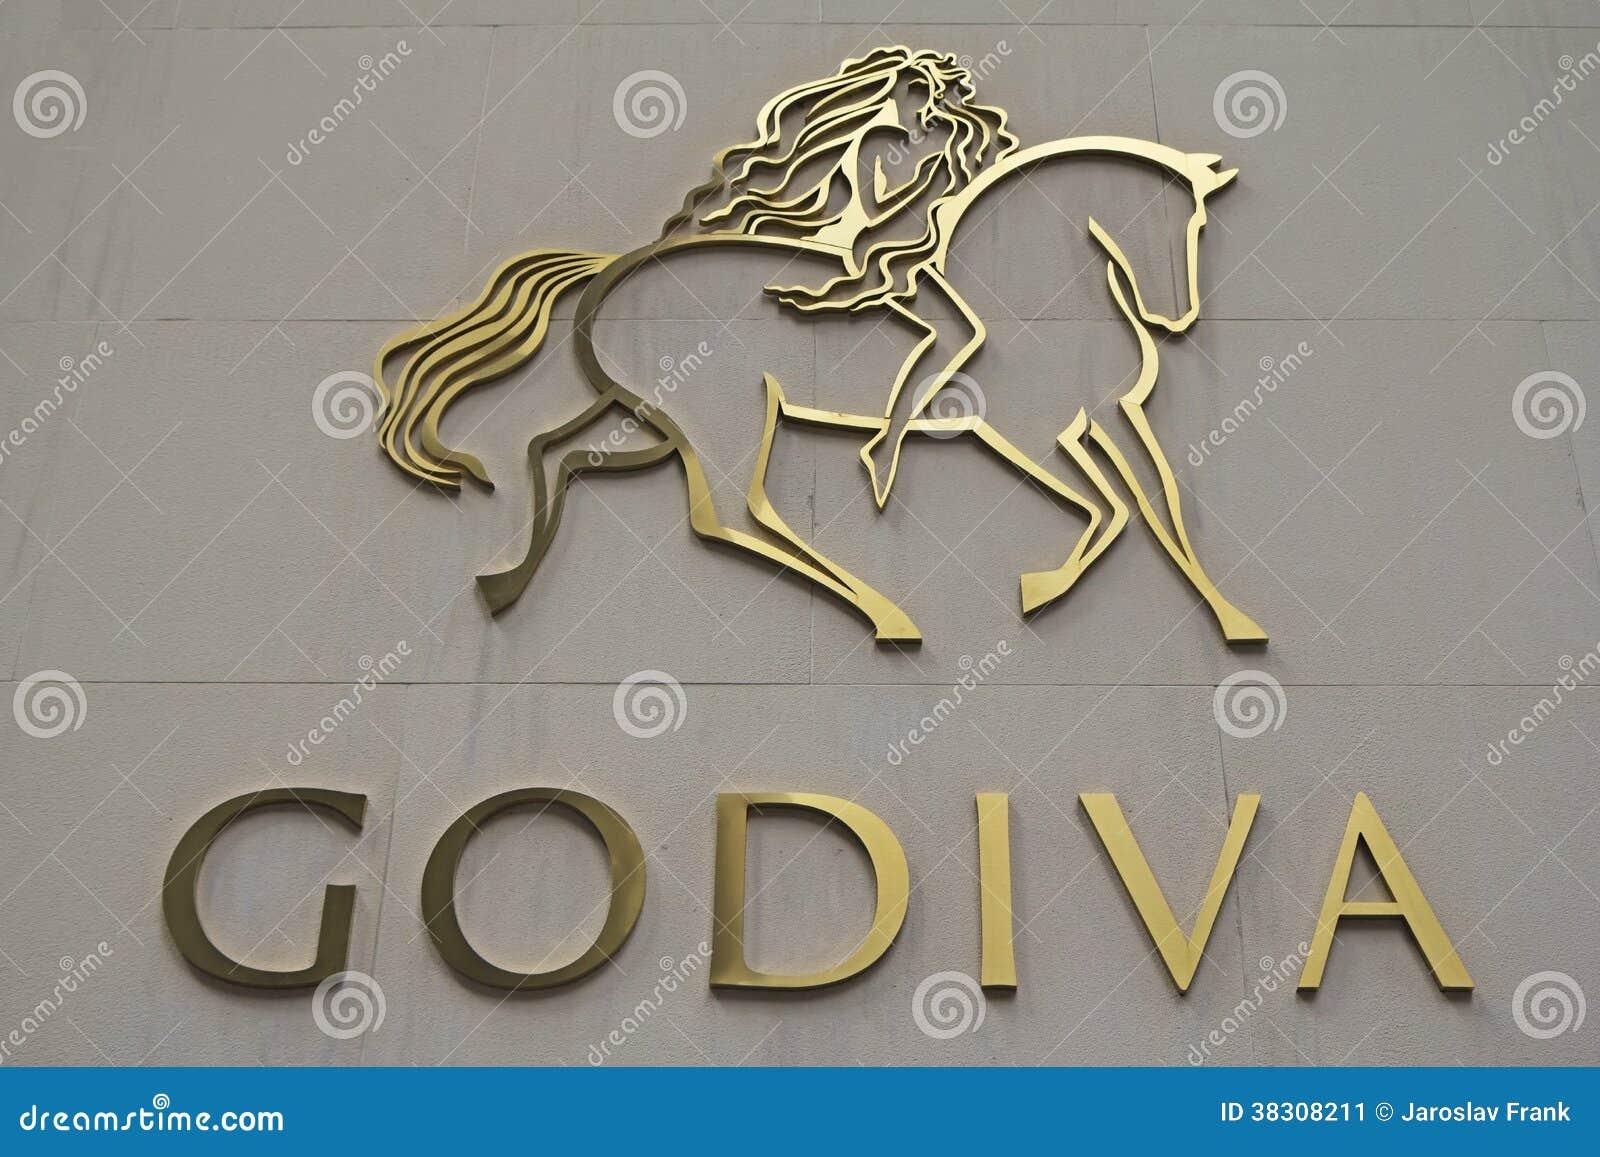 Godiva Chocolates Corporate Office